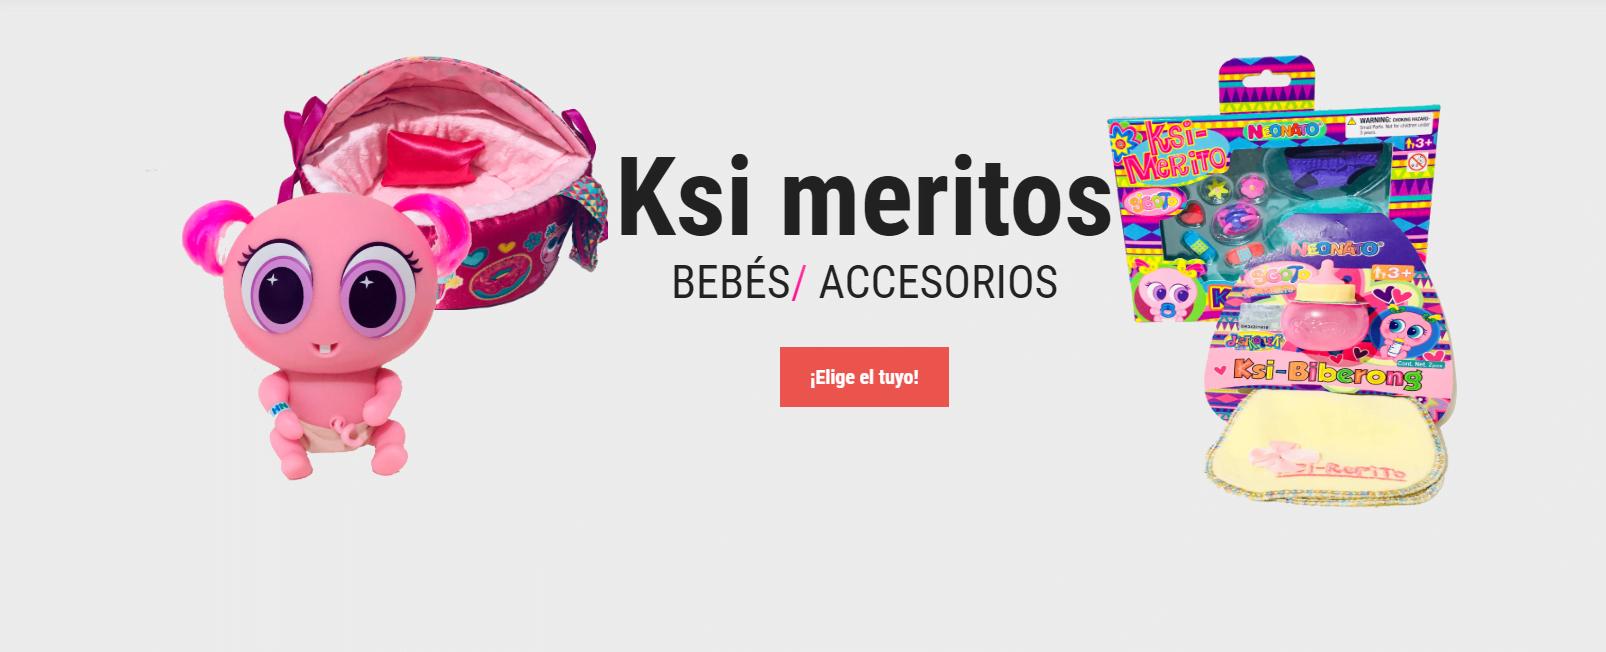 Comprar Ksi Meritos online